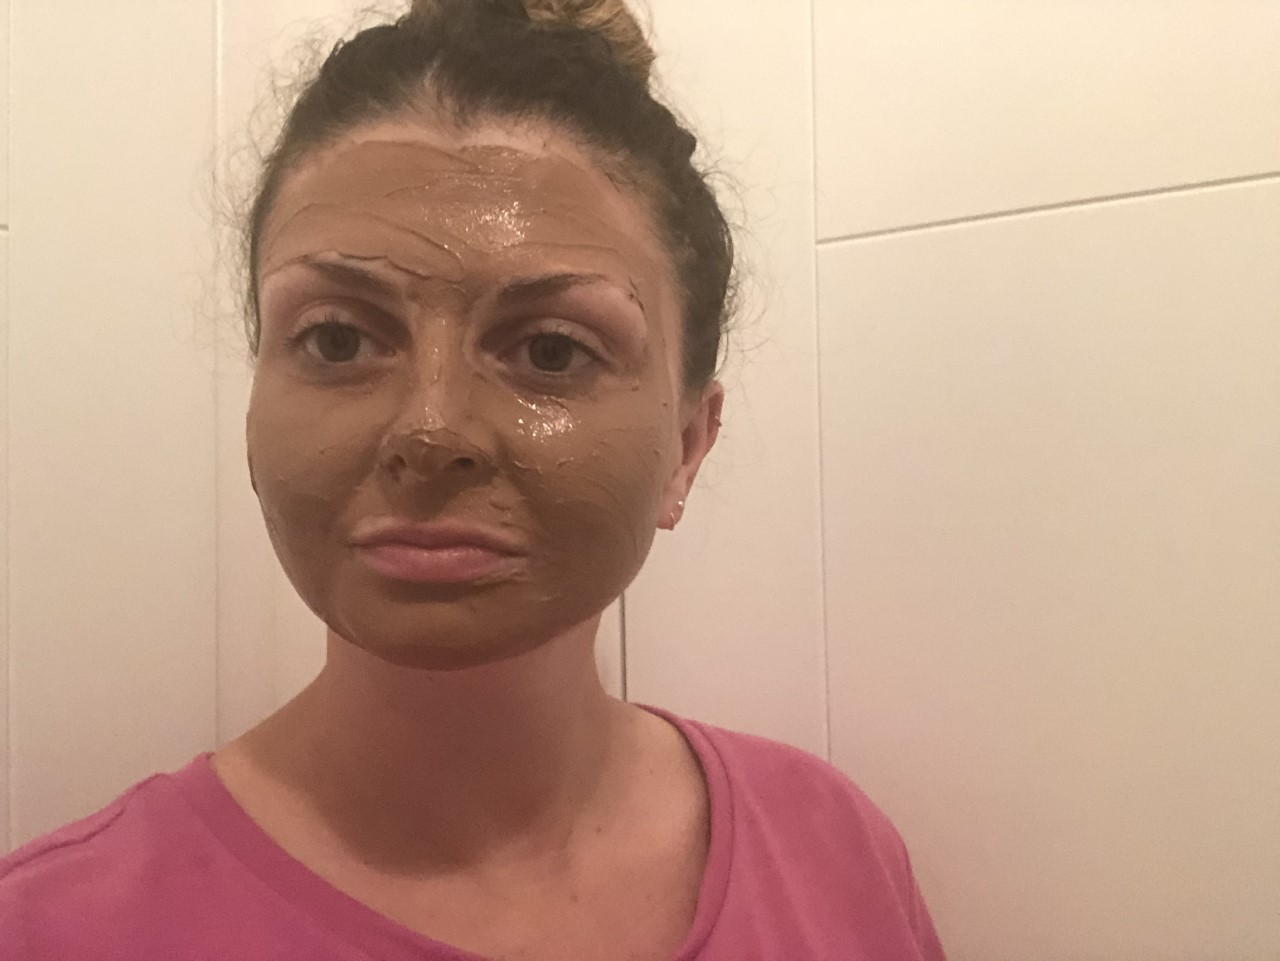 face mask Friday